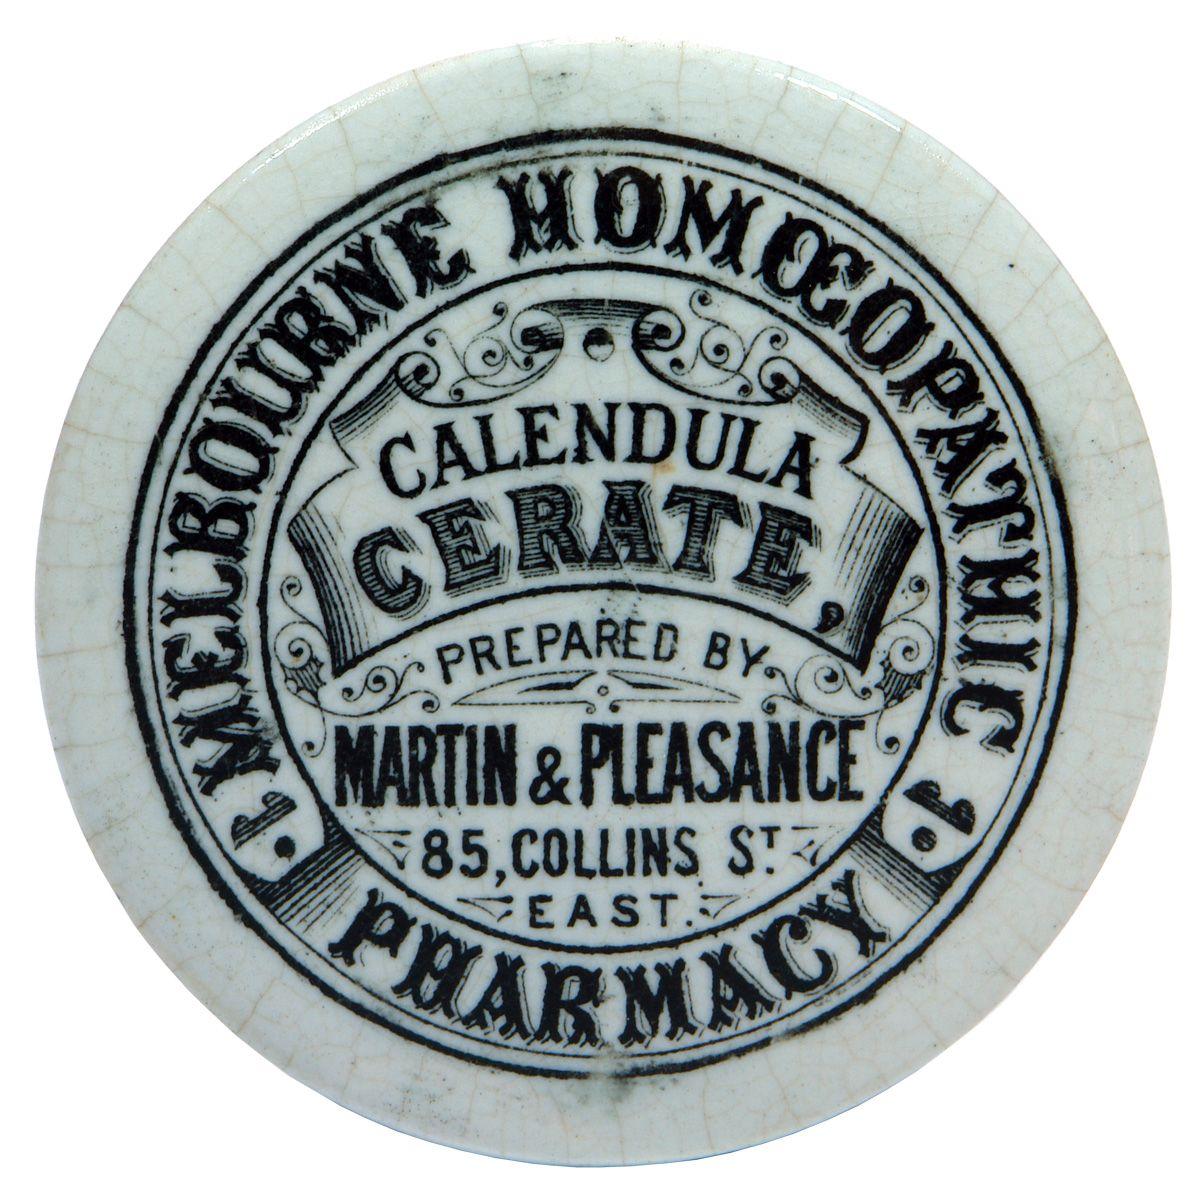 Melbourne Homeopathic Pharmacy, Martin & Pleasance. Calendula Cerate. Black & White Ceramic Pot Lid. c1890s.